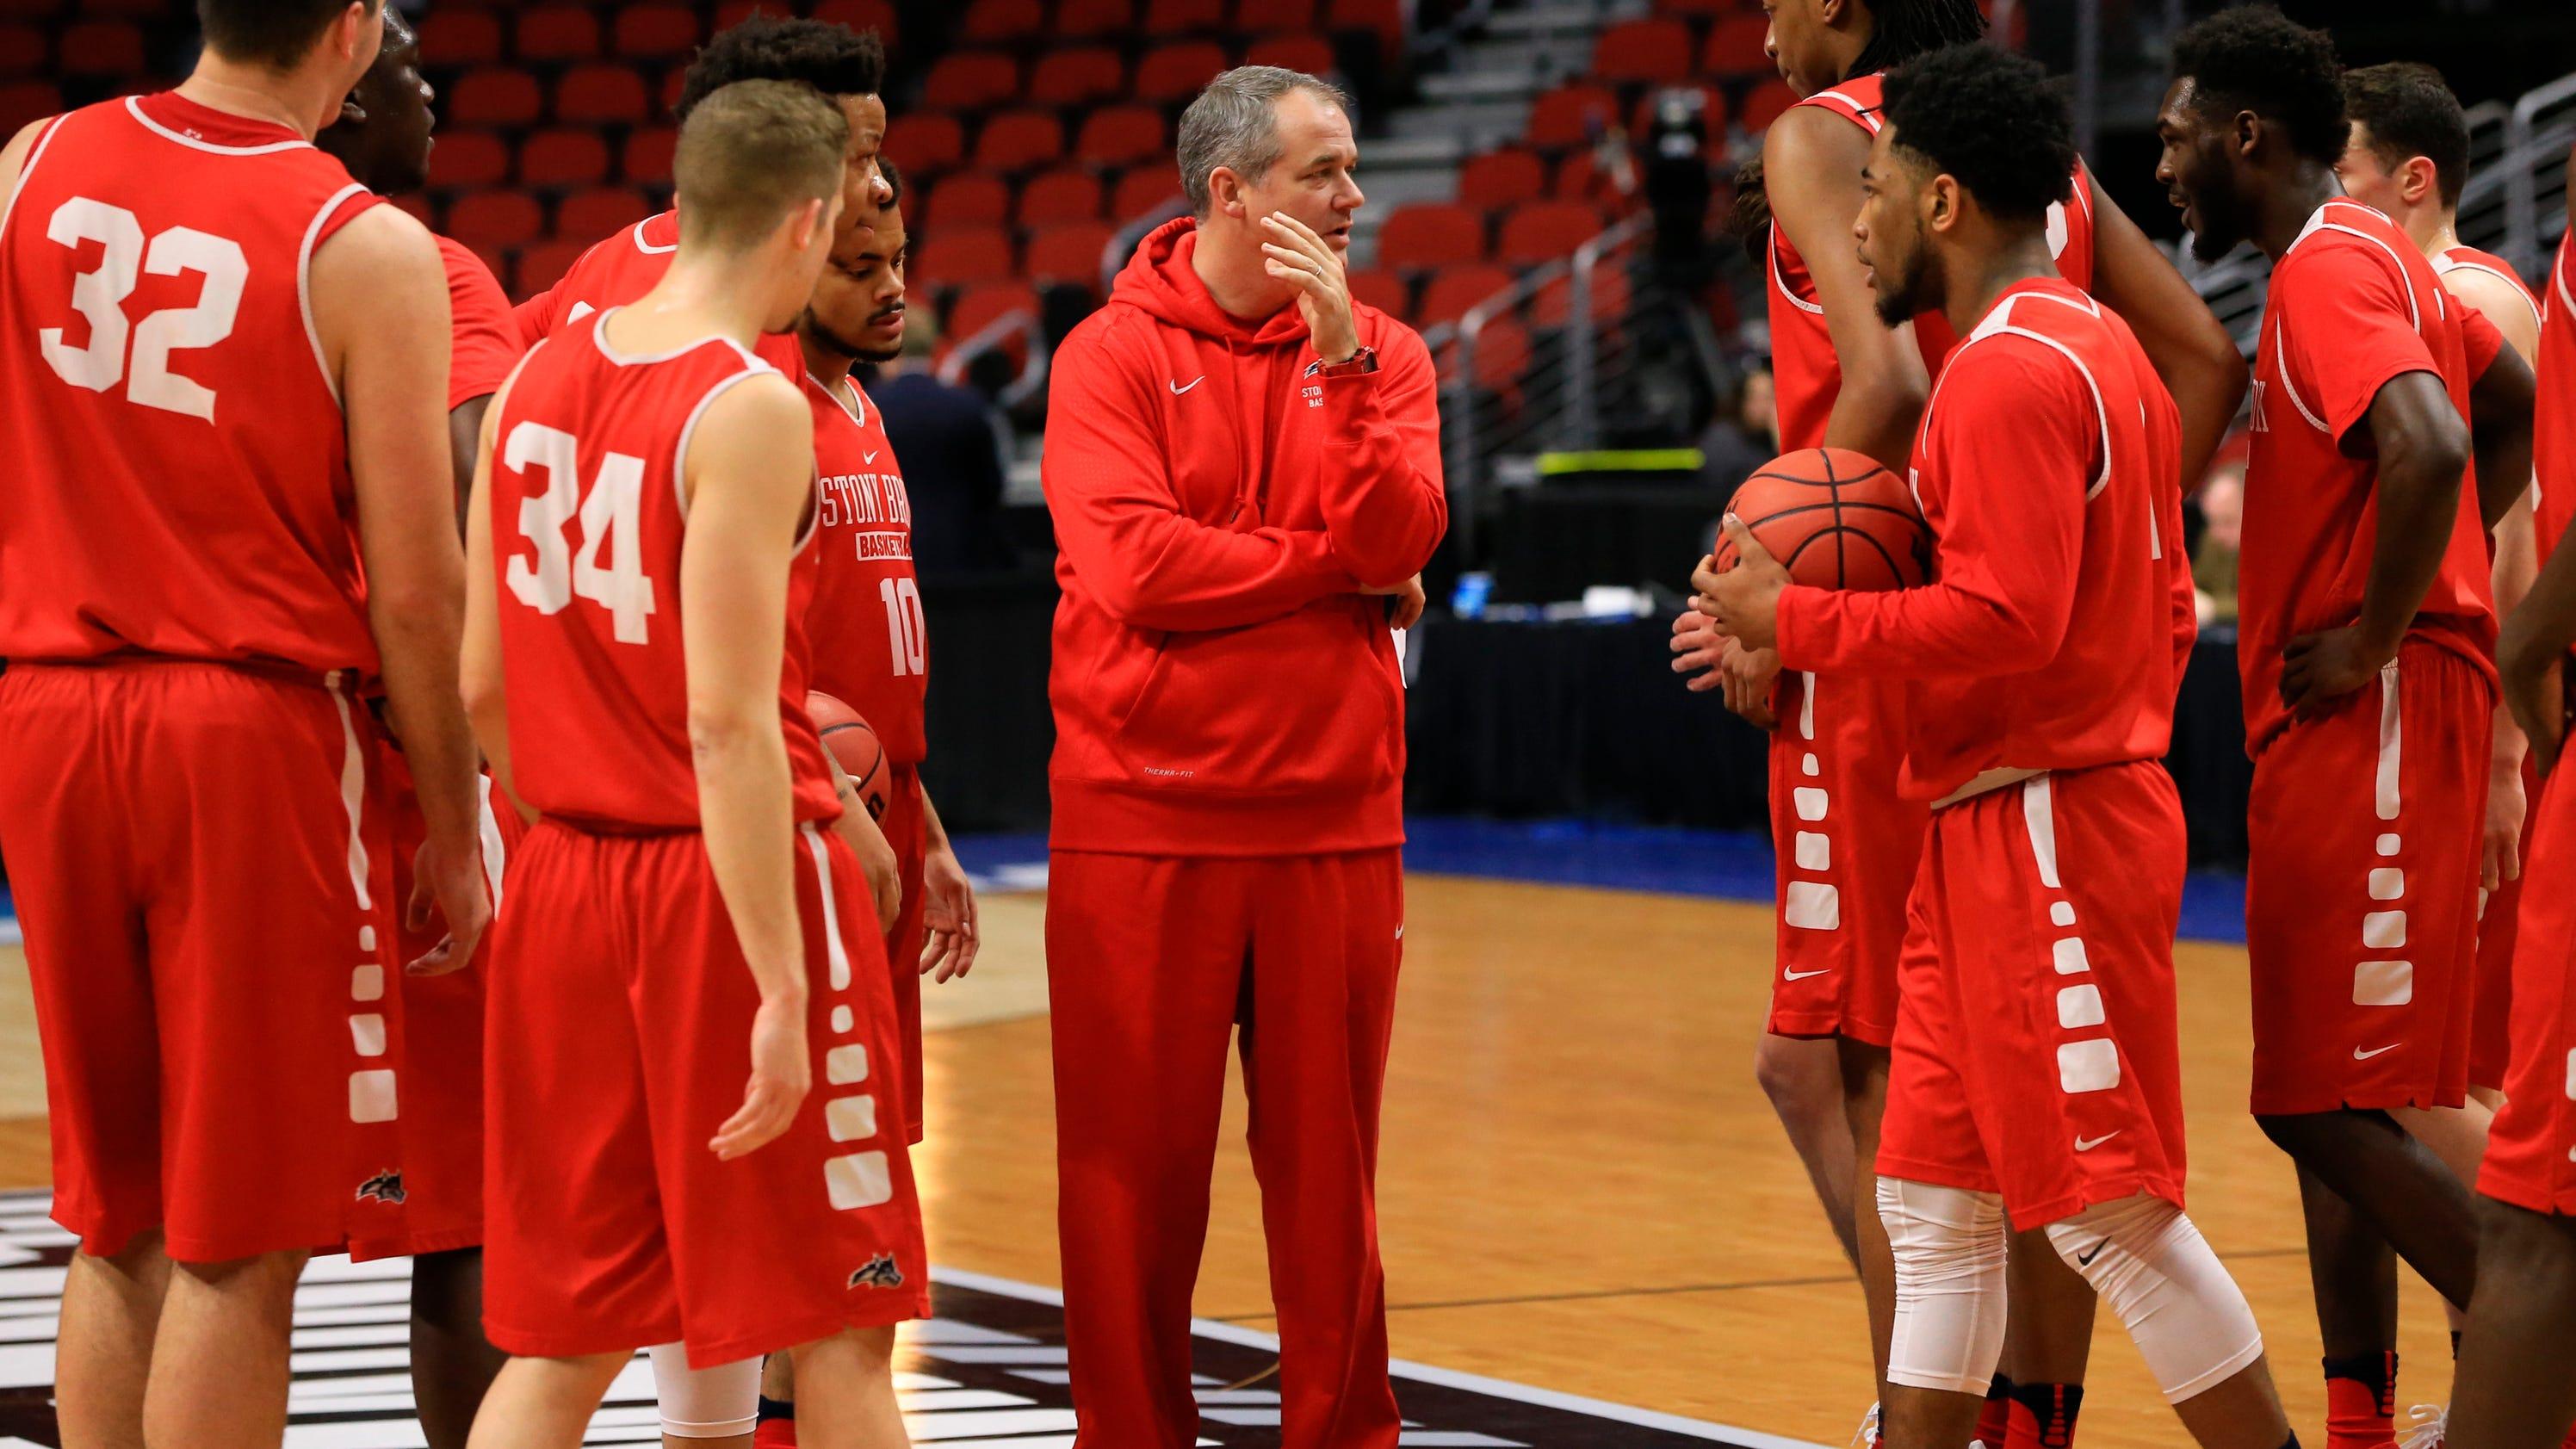 Rutgers spends B1G for basketball coach Steve Pikiell